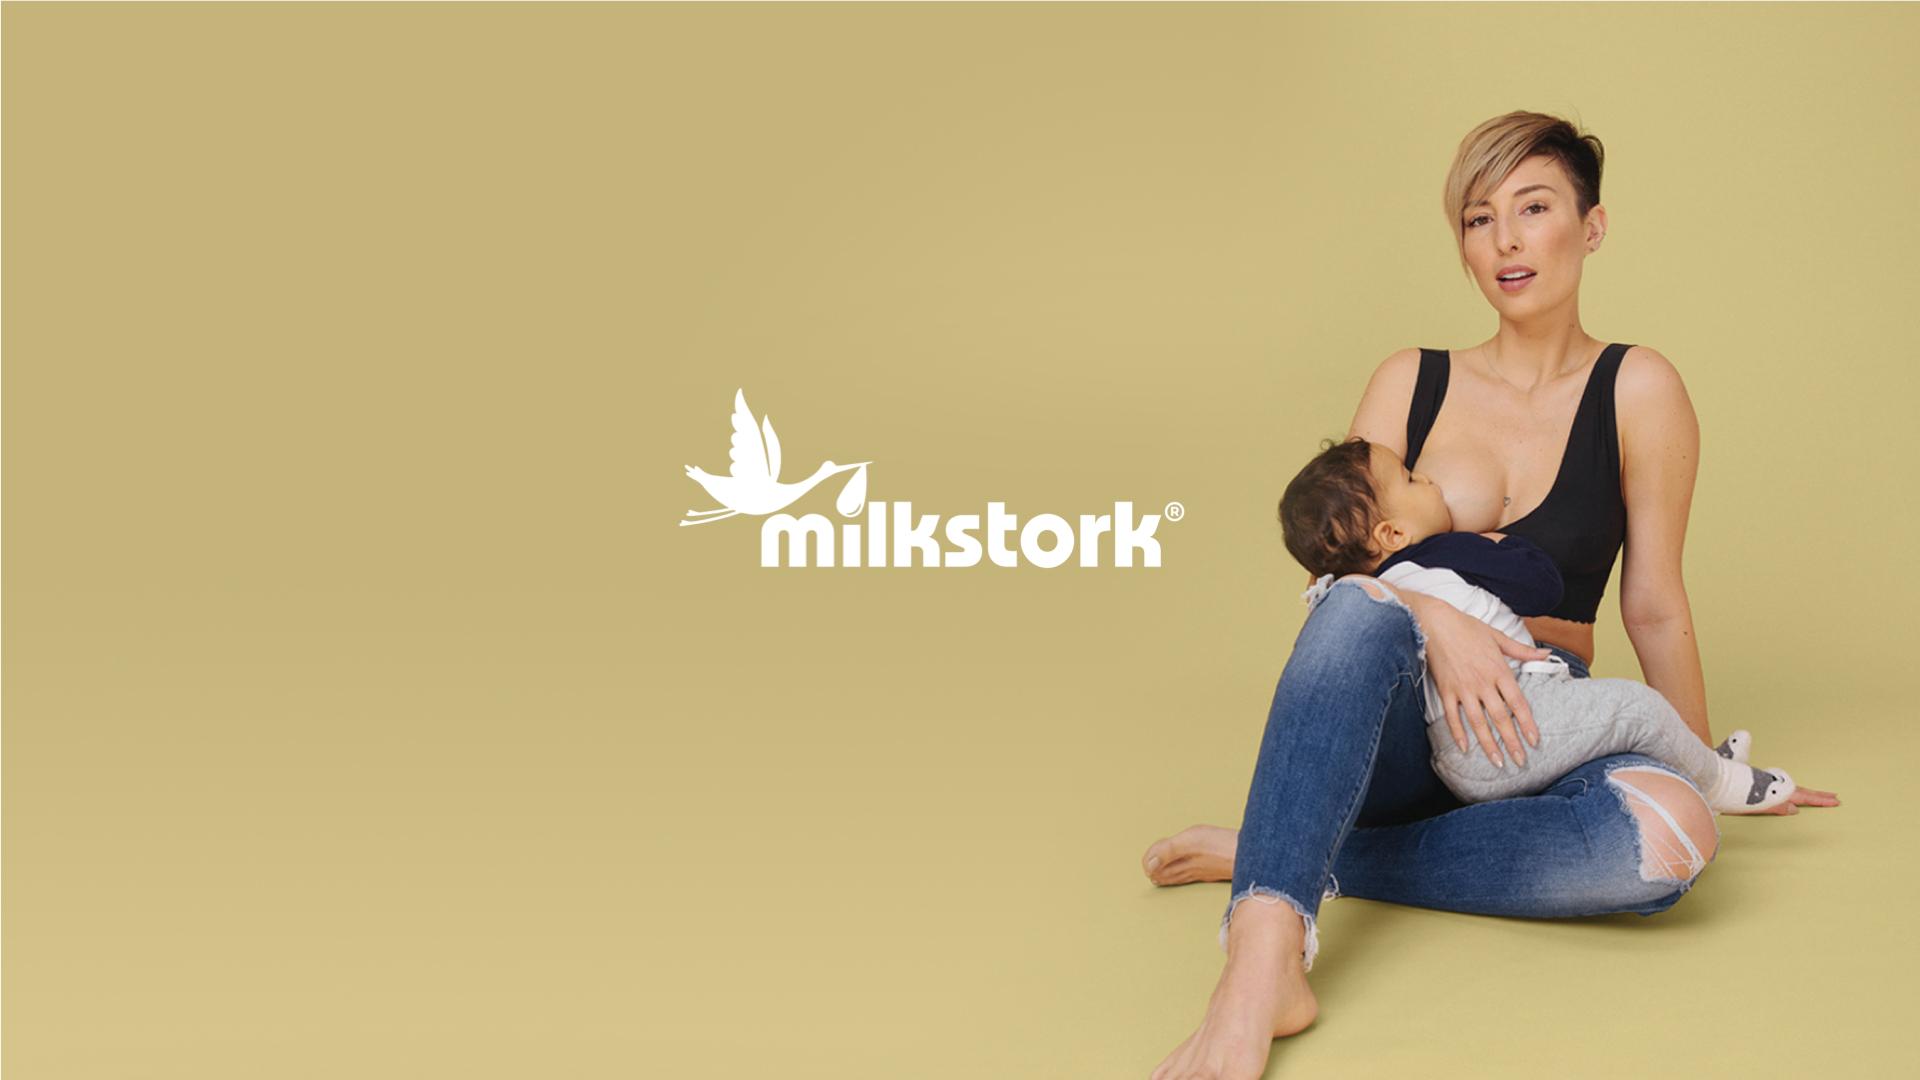 milkstork landing.001.jpeg